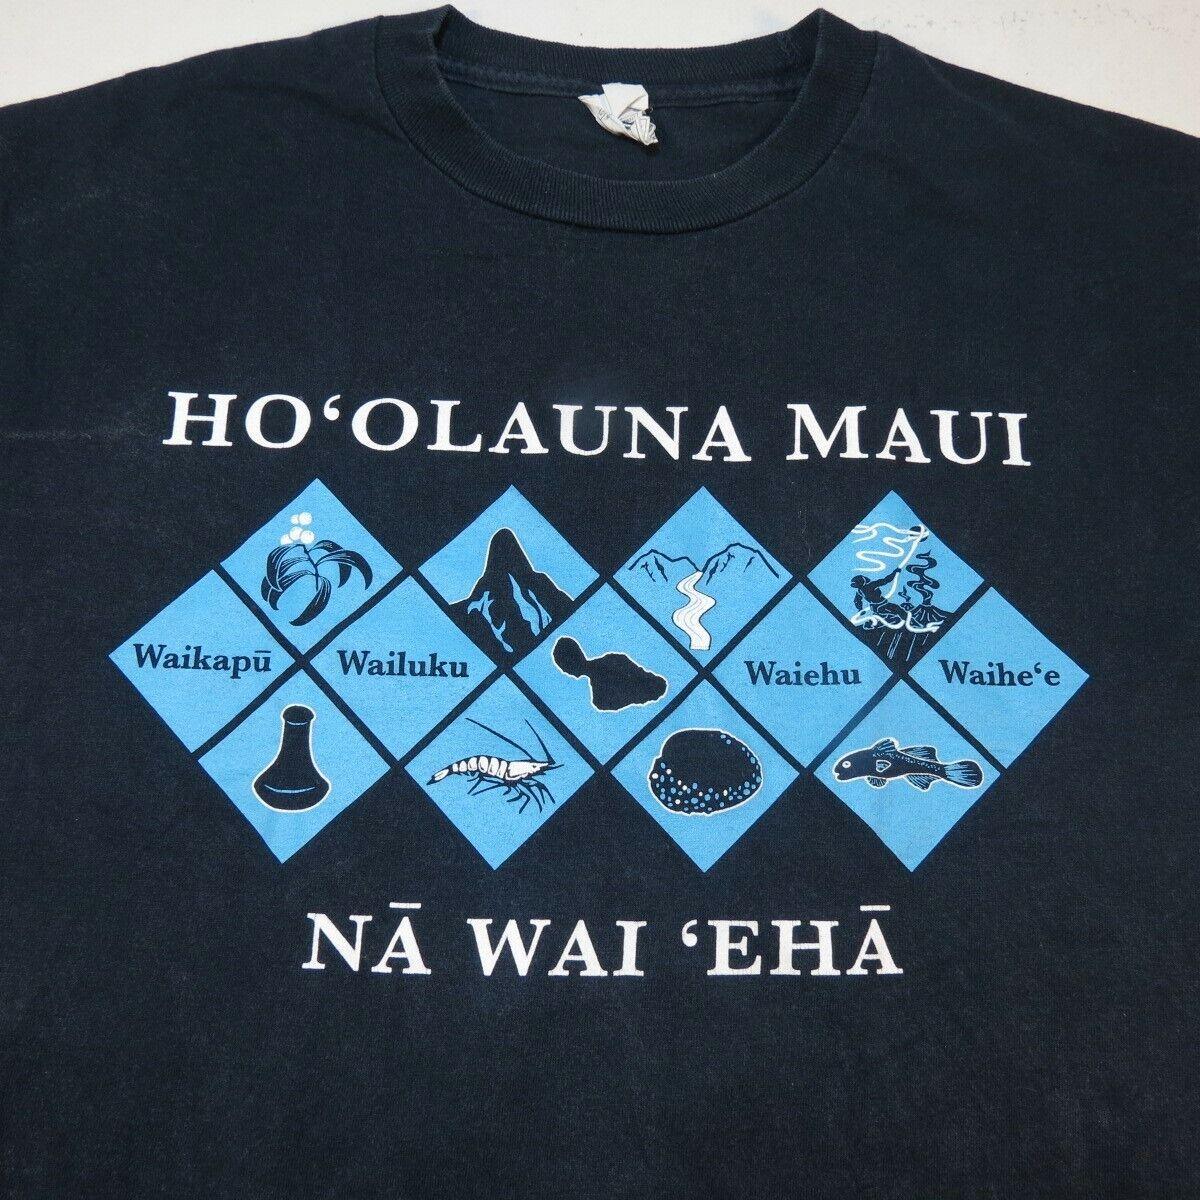 Vintage Hawaii Travel Decal T-Shirt Islands Maui King Kamehameha Honolulu